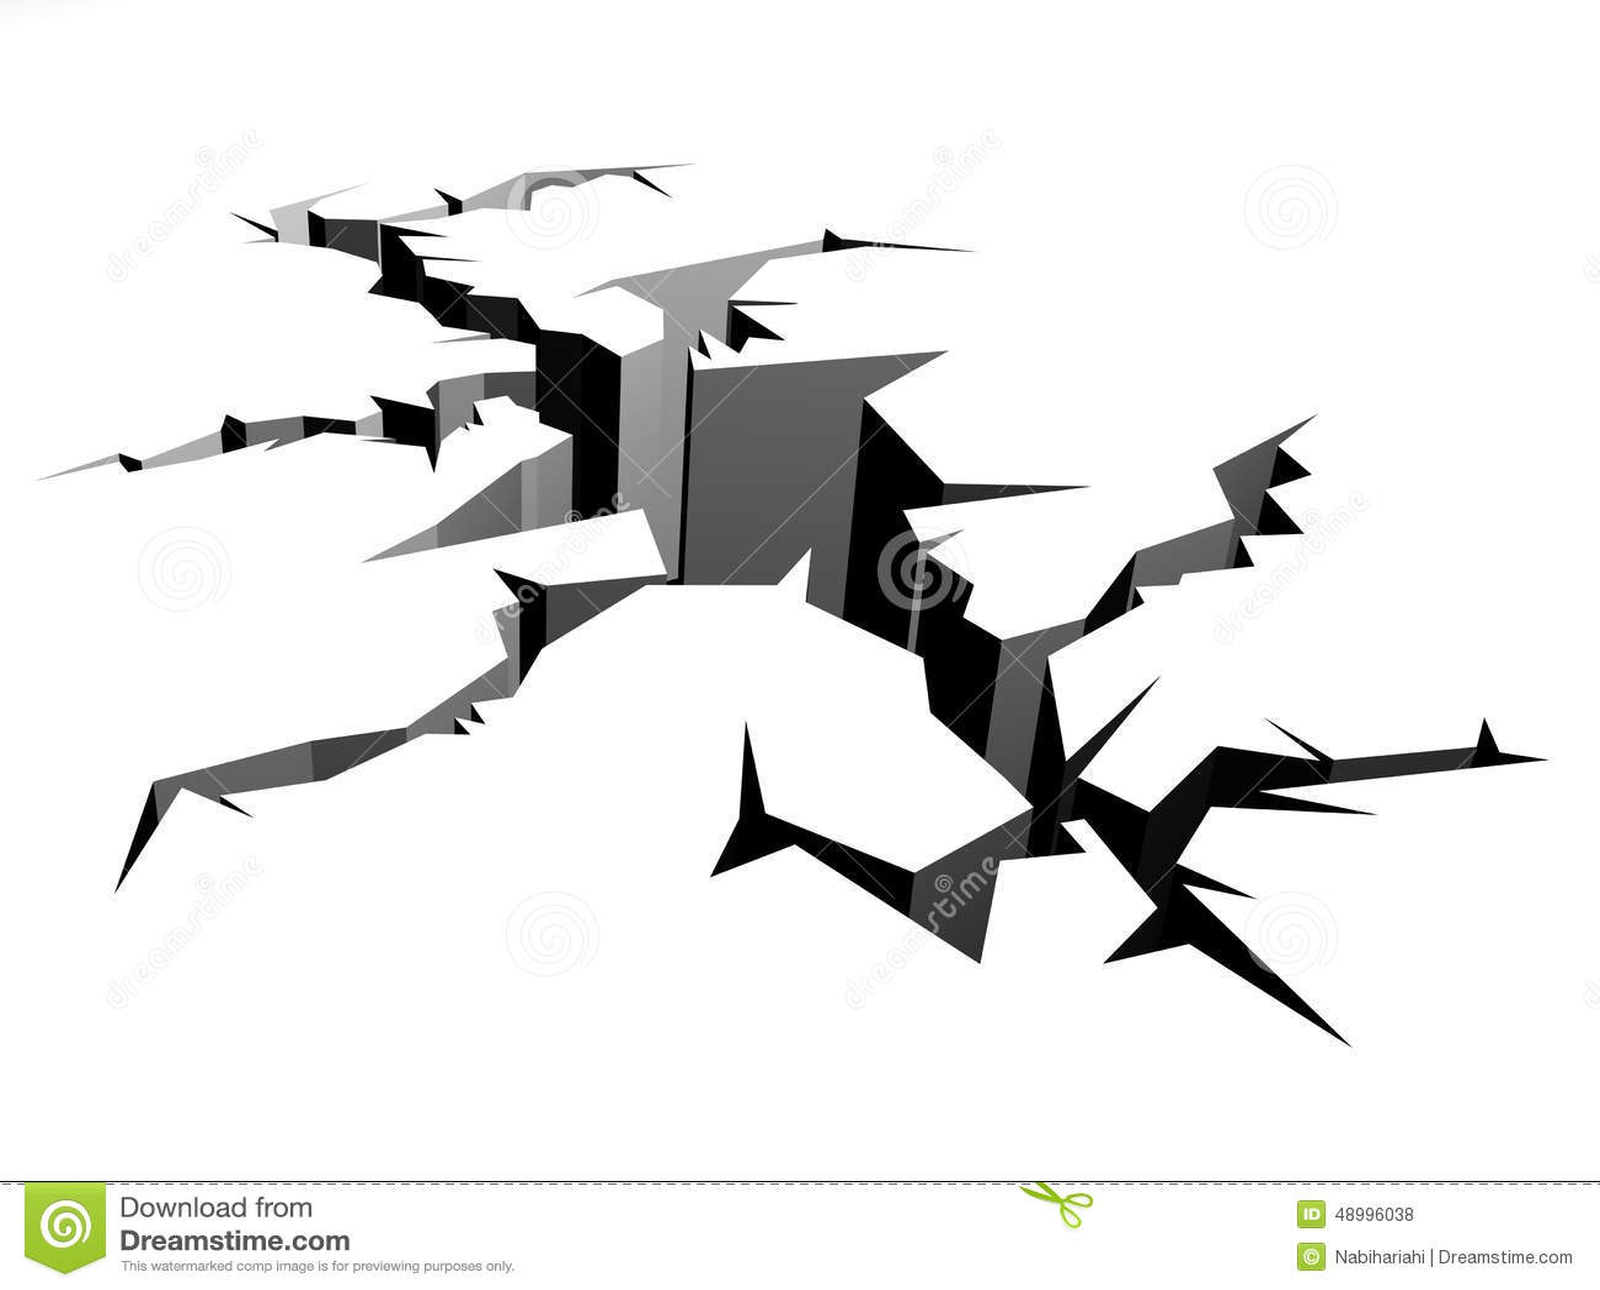 Earthquake stock illustration. Image of break, concrete ...